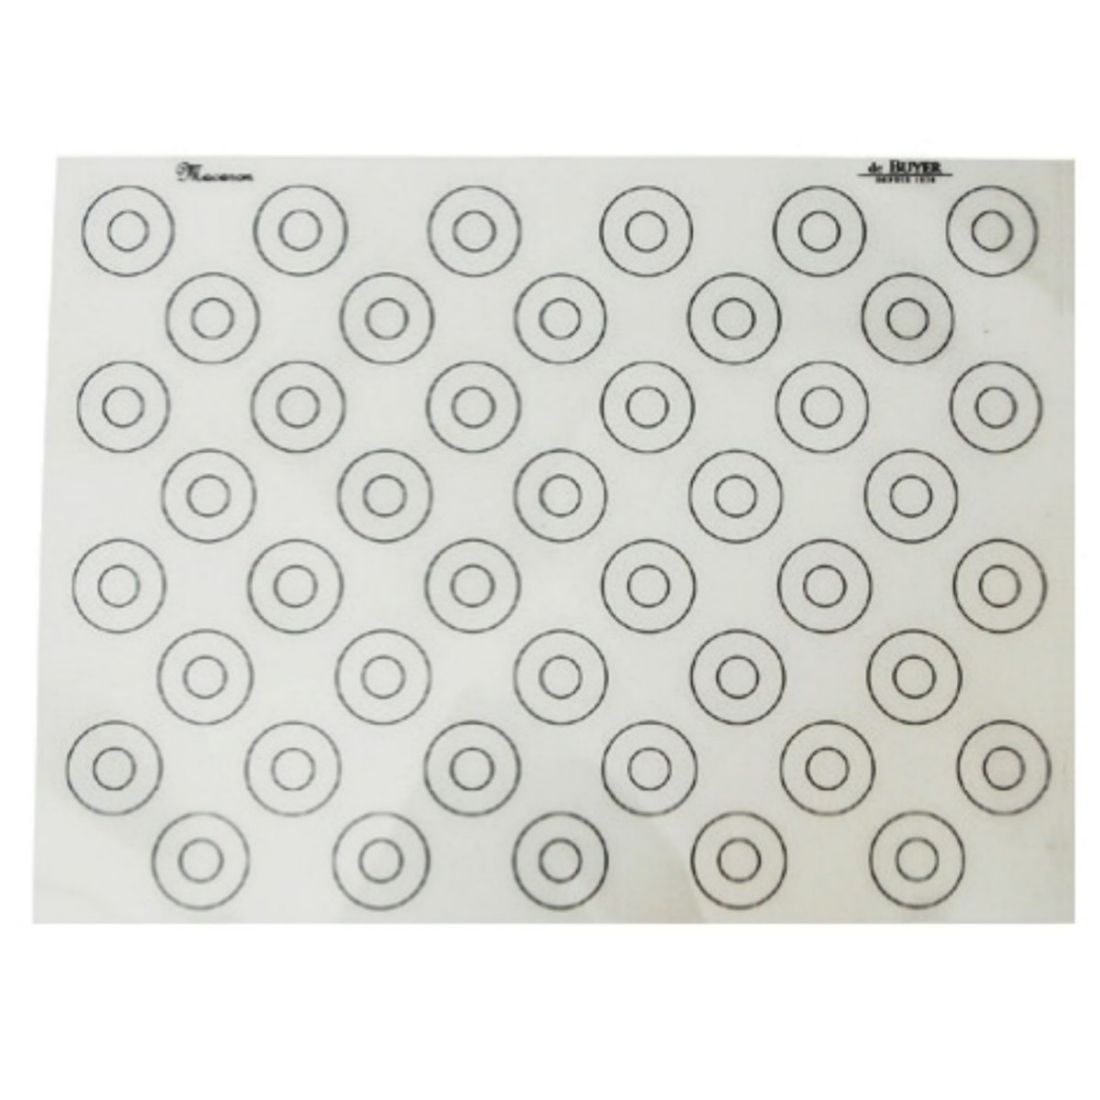 Podložka silikonová Macaron 60x40 cm